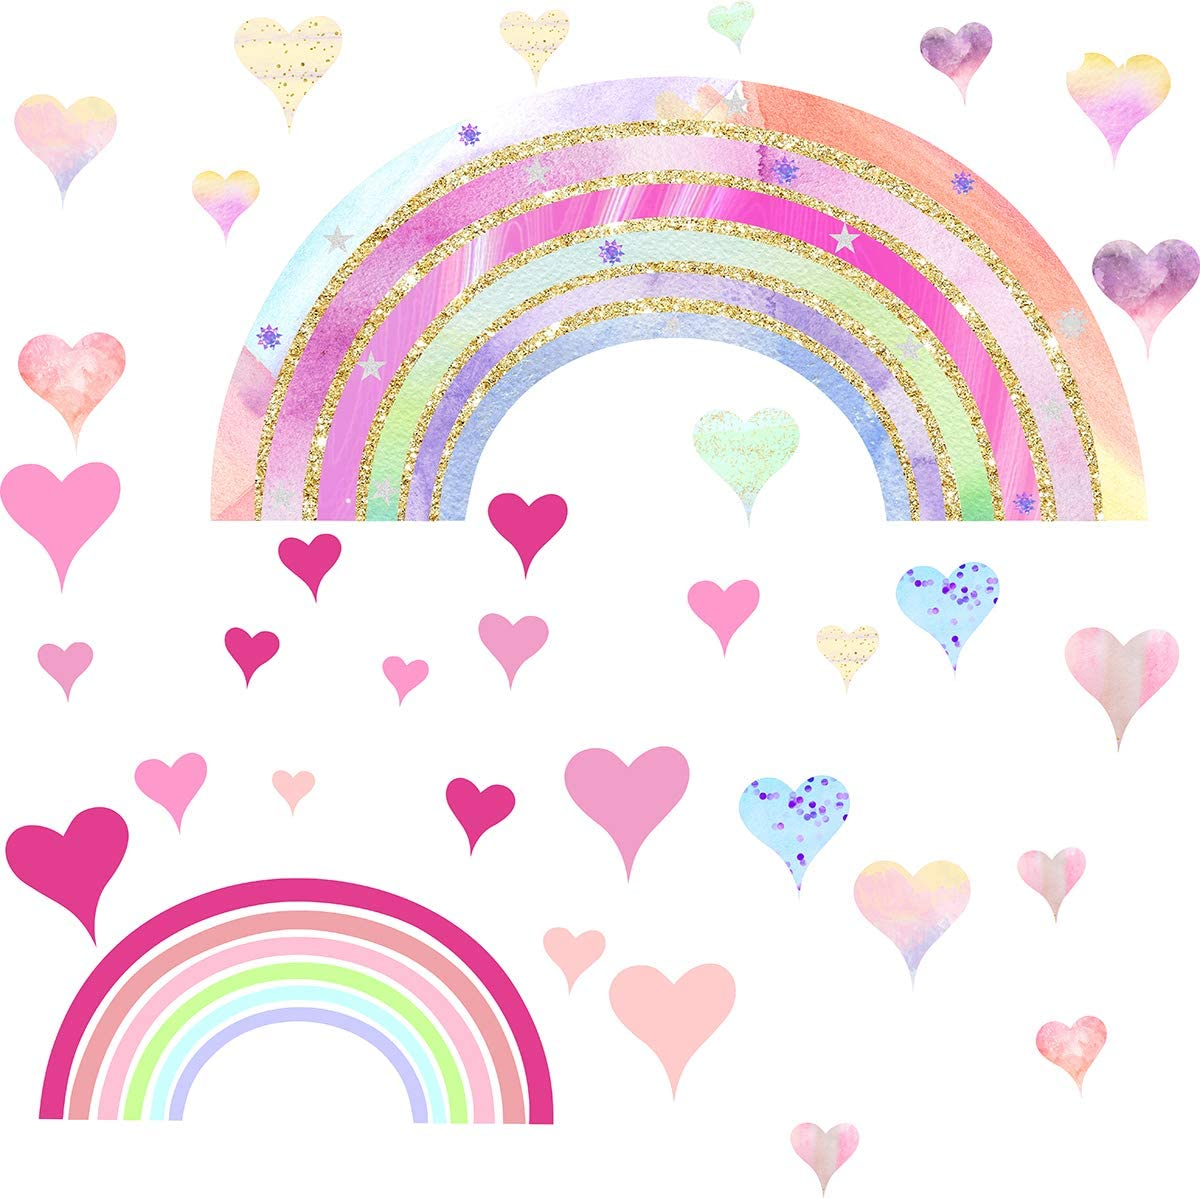 Wavy Rainbow Ribbon Wall Border Removable Fabric Wall Decal Girls Wall Decor Pastel Rainbow Wall Border